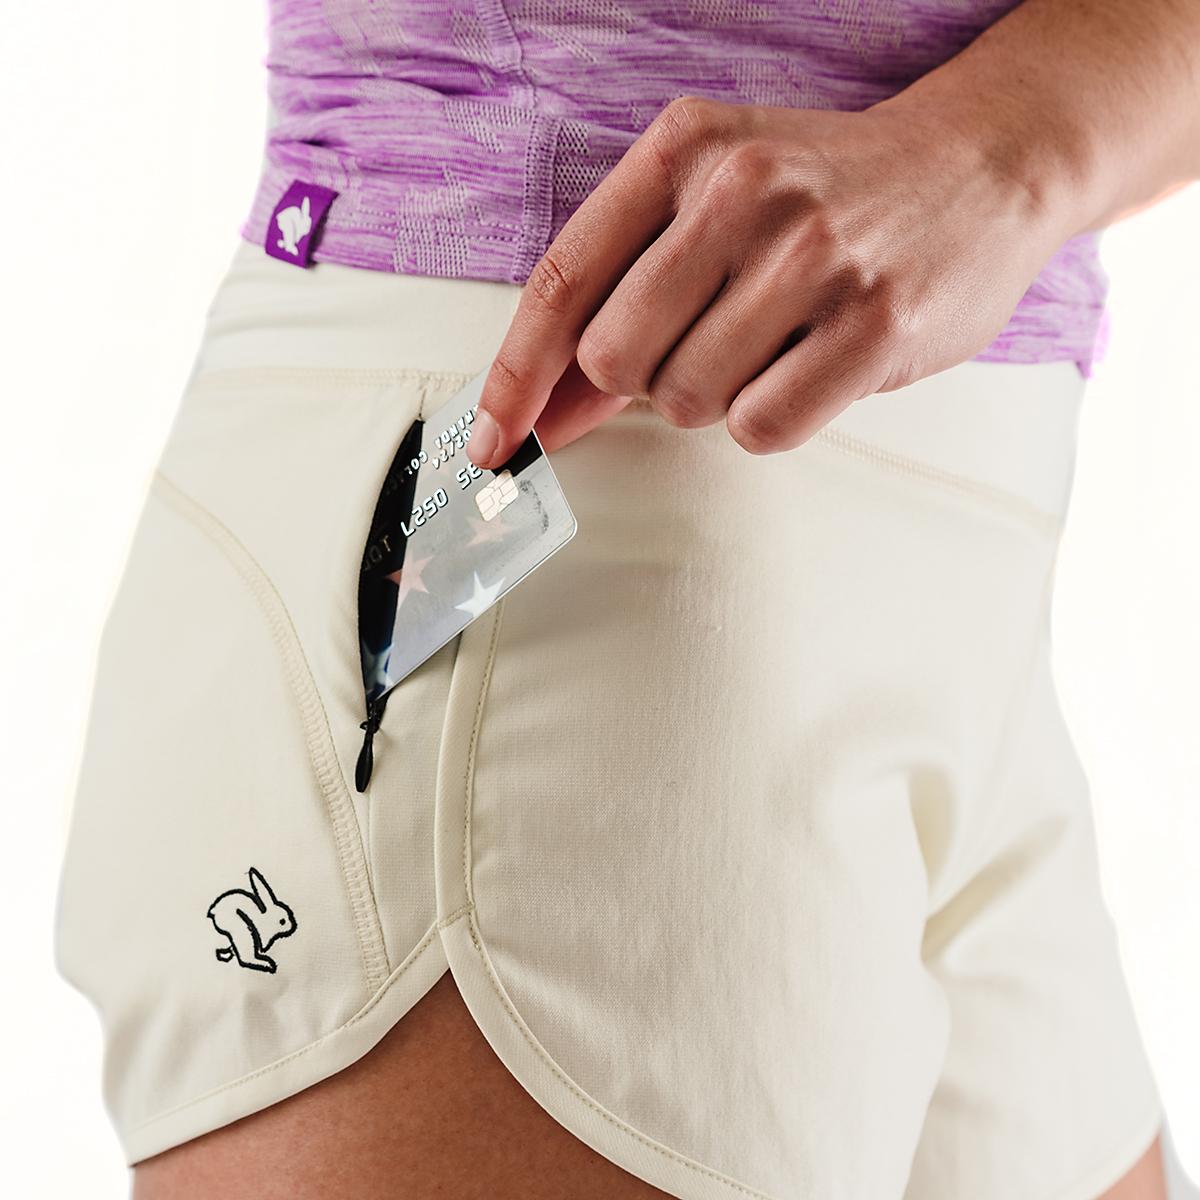 "Women's Rabbit Pocket Shorts 2.5"" - Color: Vanilla Ice - Size: XS, Vanilla Ice, large, image 5"